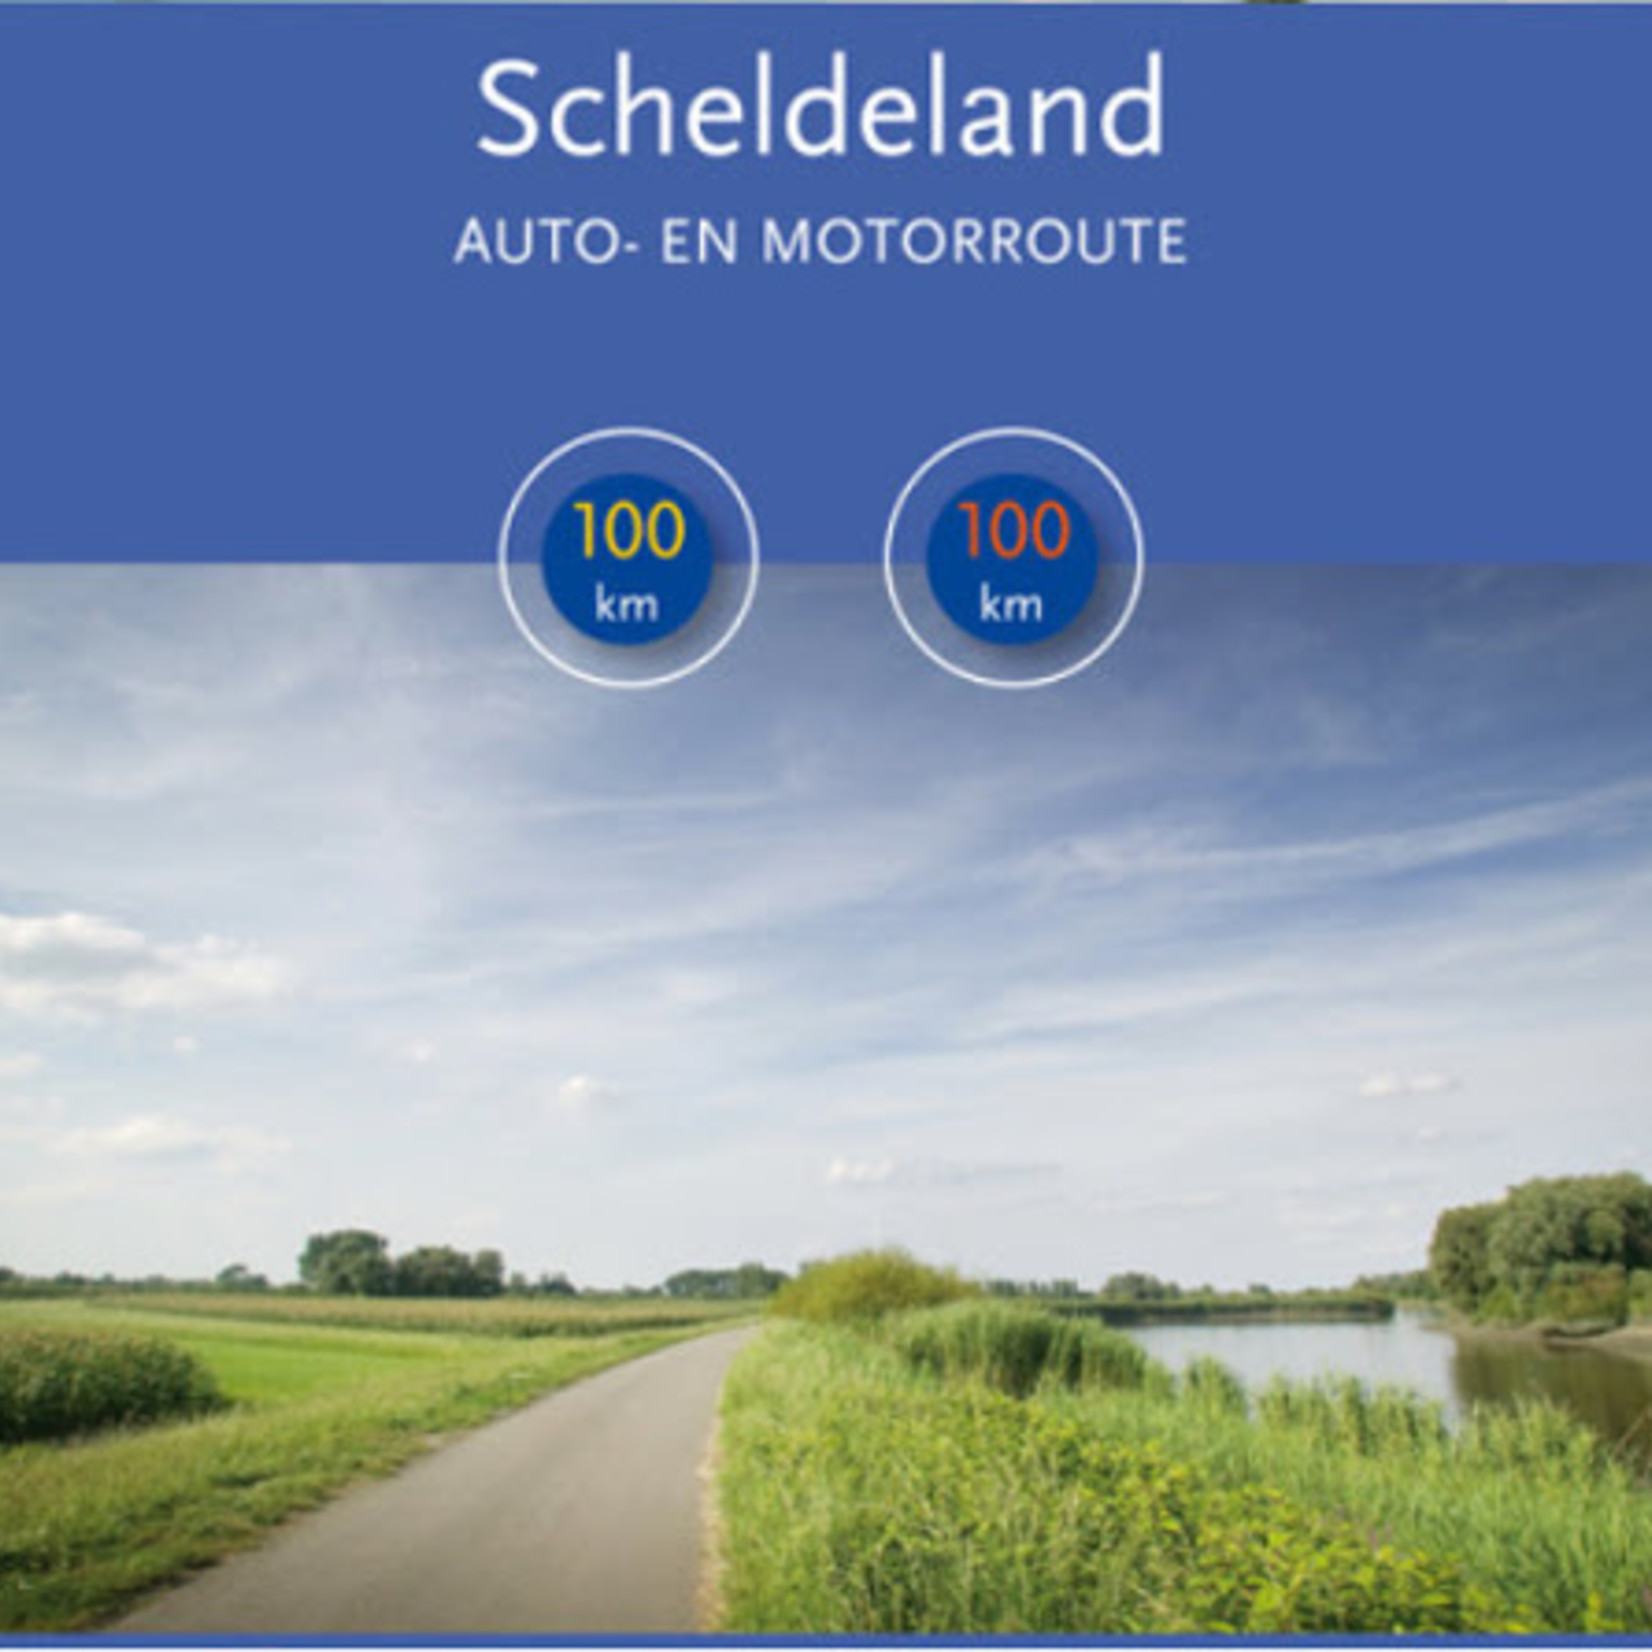 Map (car/motor) 'Scheldeland' (100km)